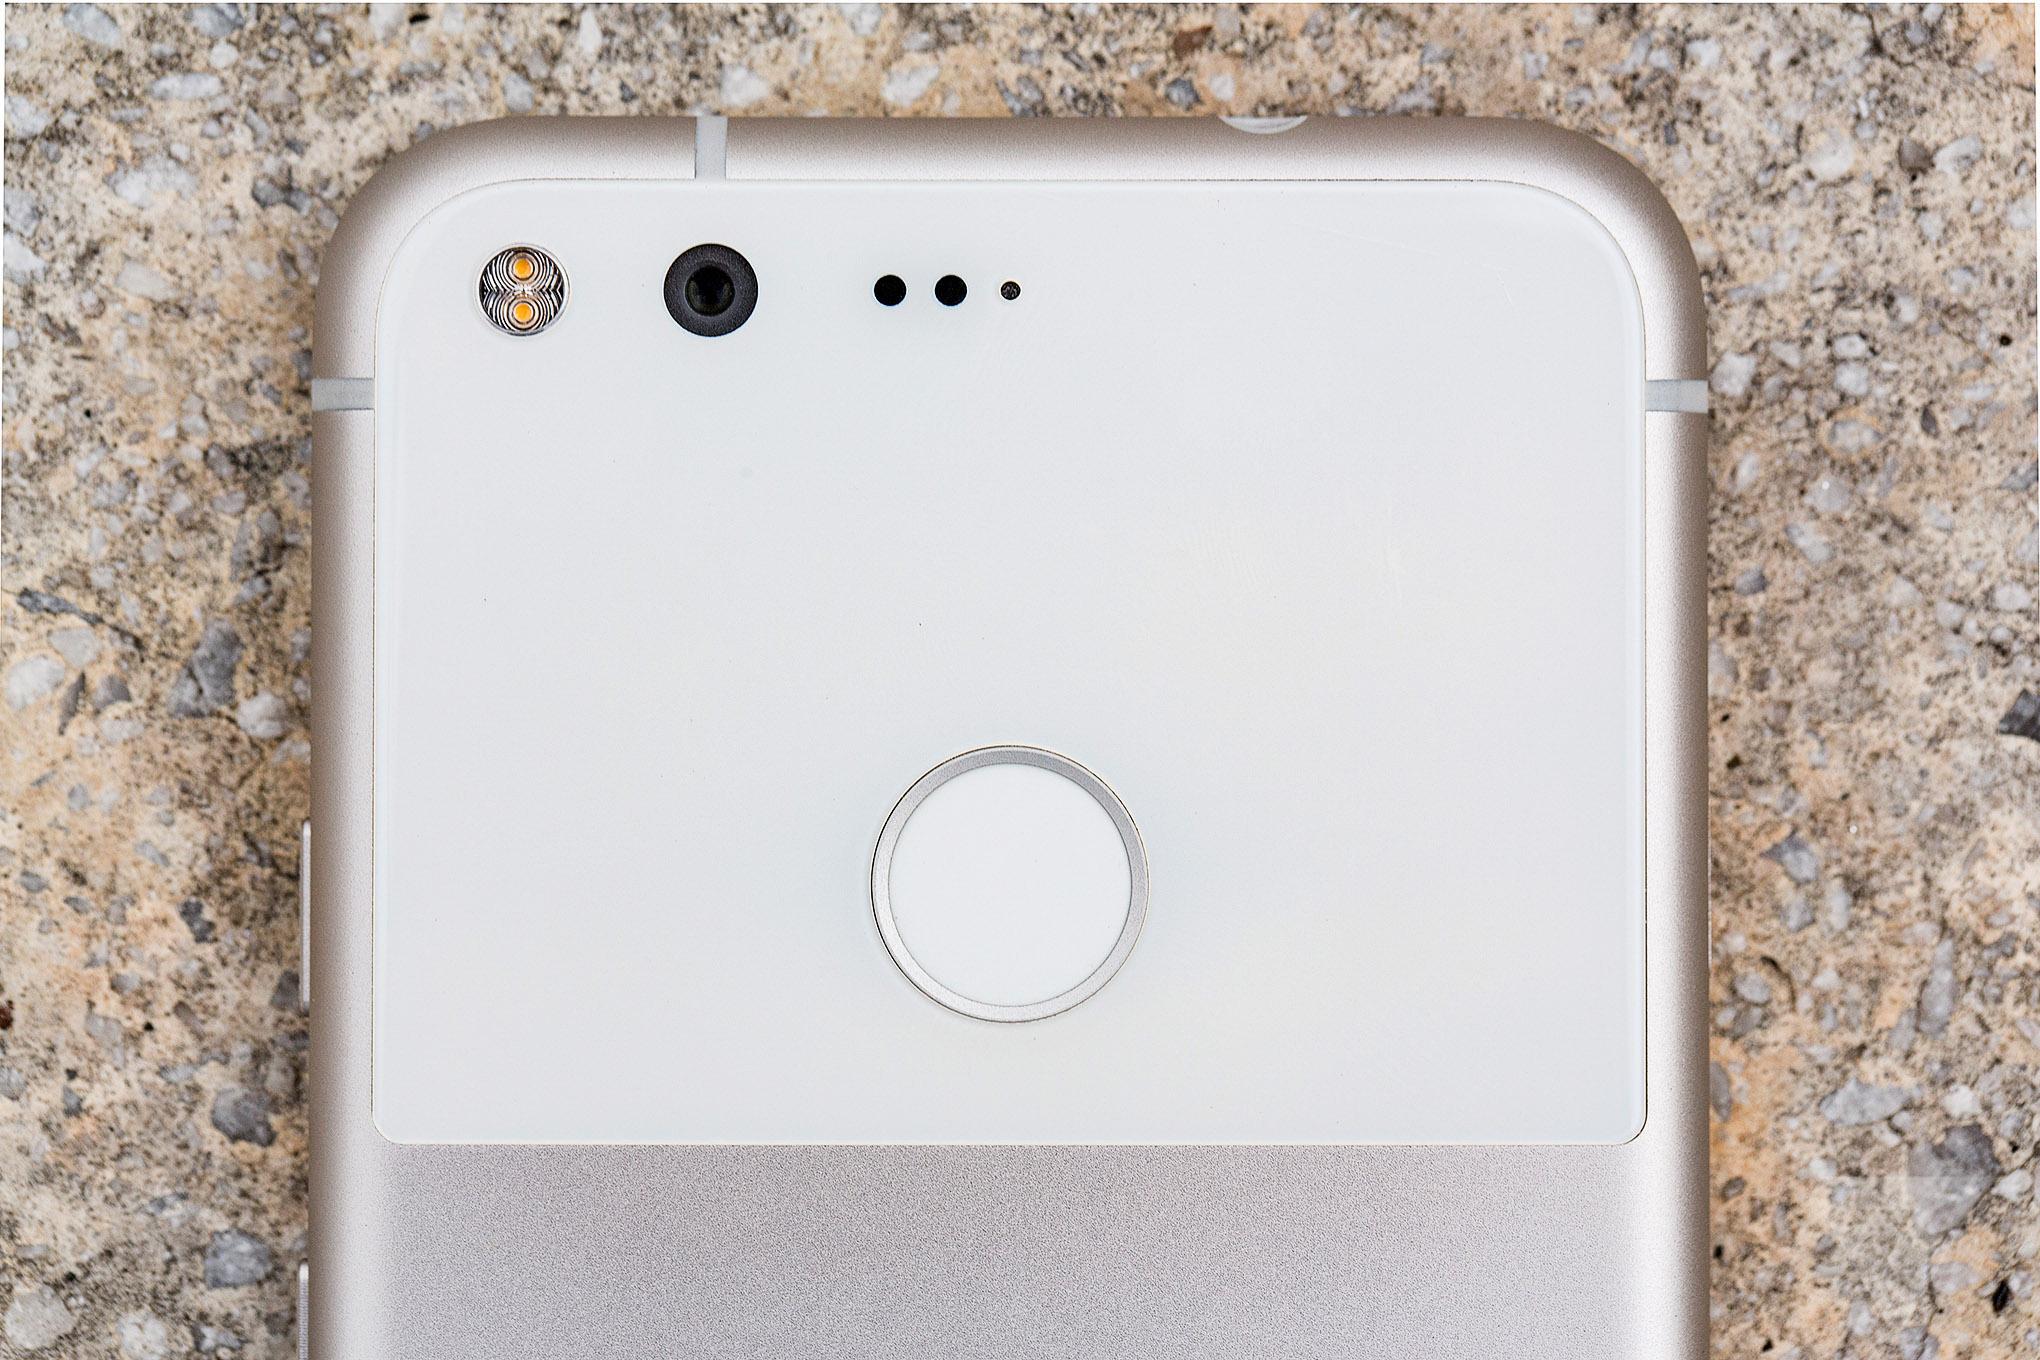 Подробней о Sony IMX378 — камере Google Pixel и BlackBerry KEYone